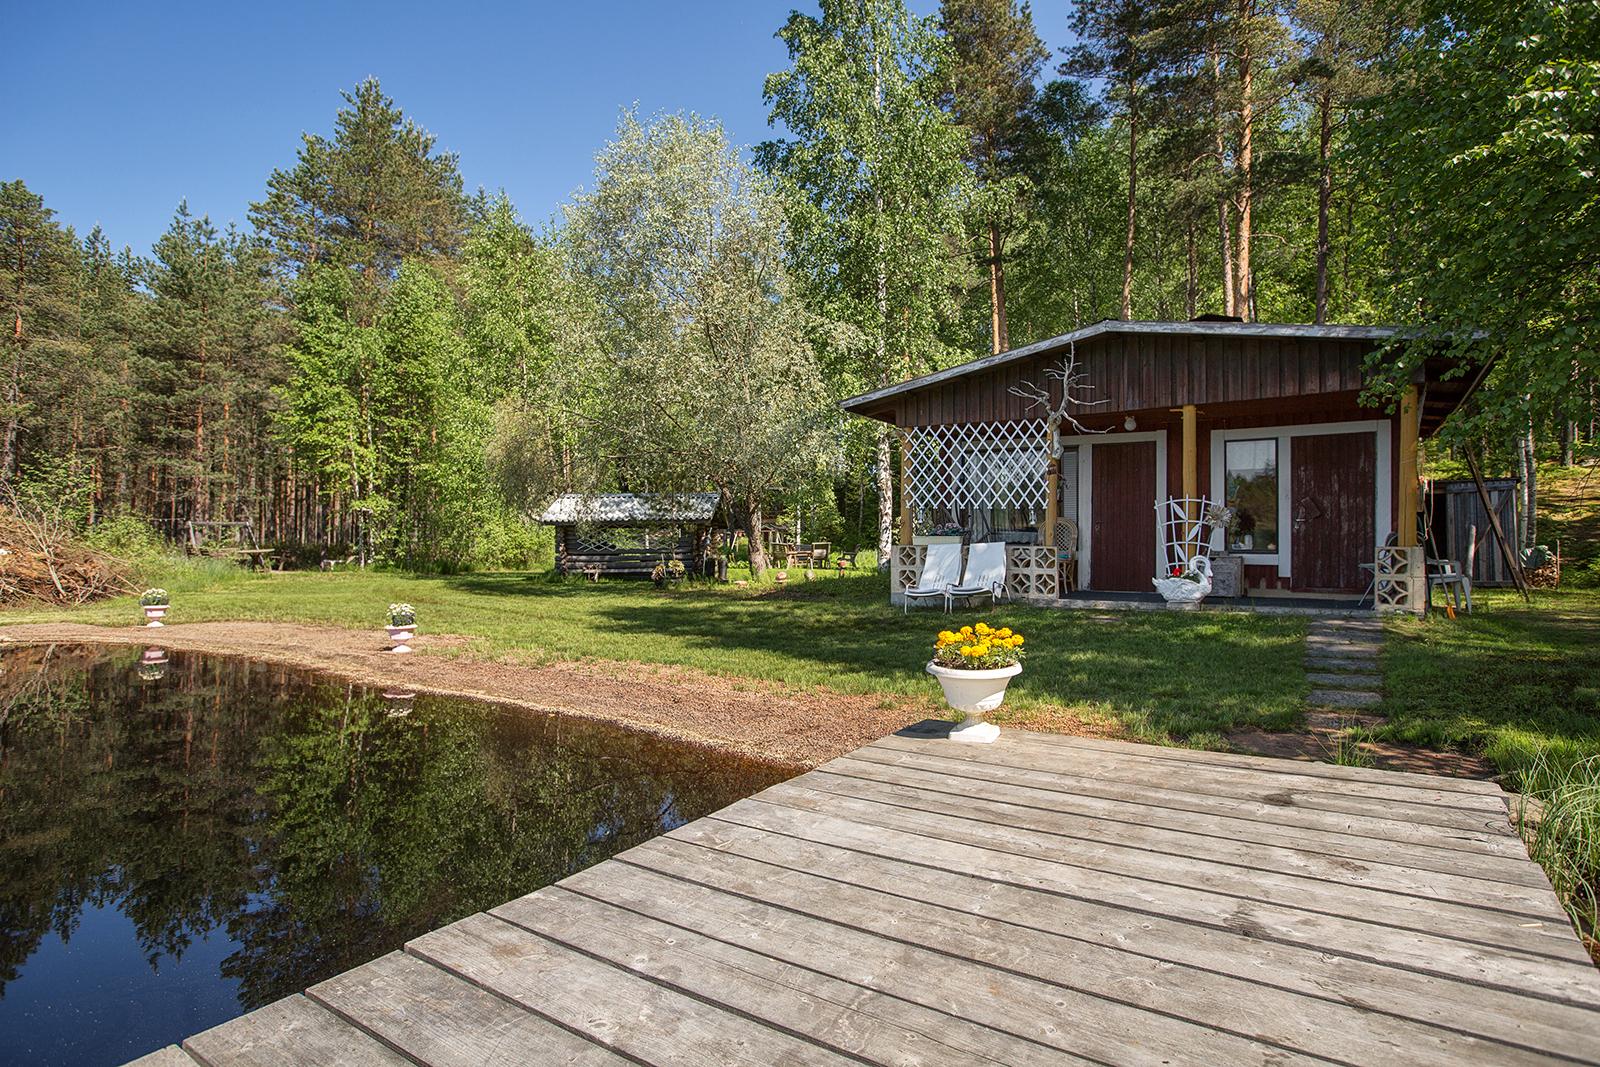 www e kontakti fi kokemuksia Kajaani